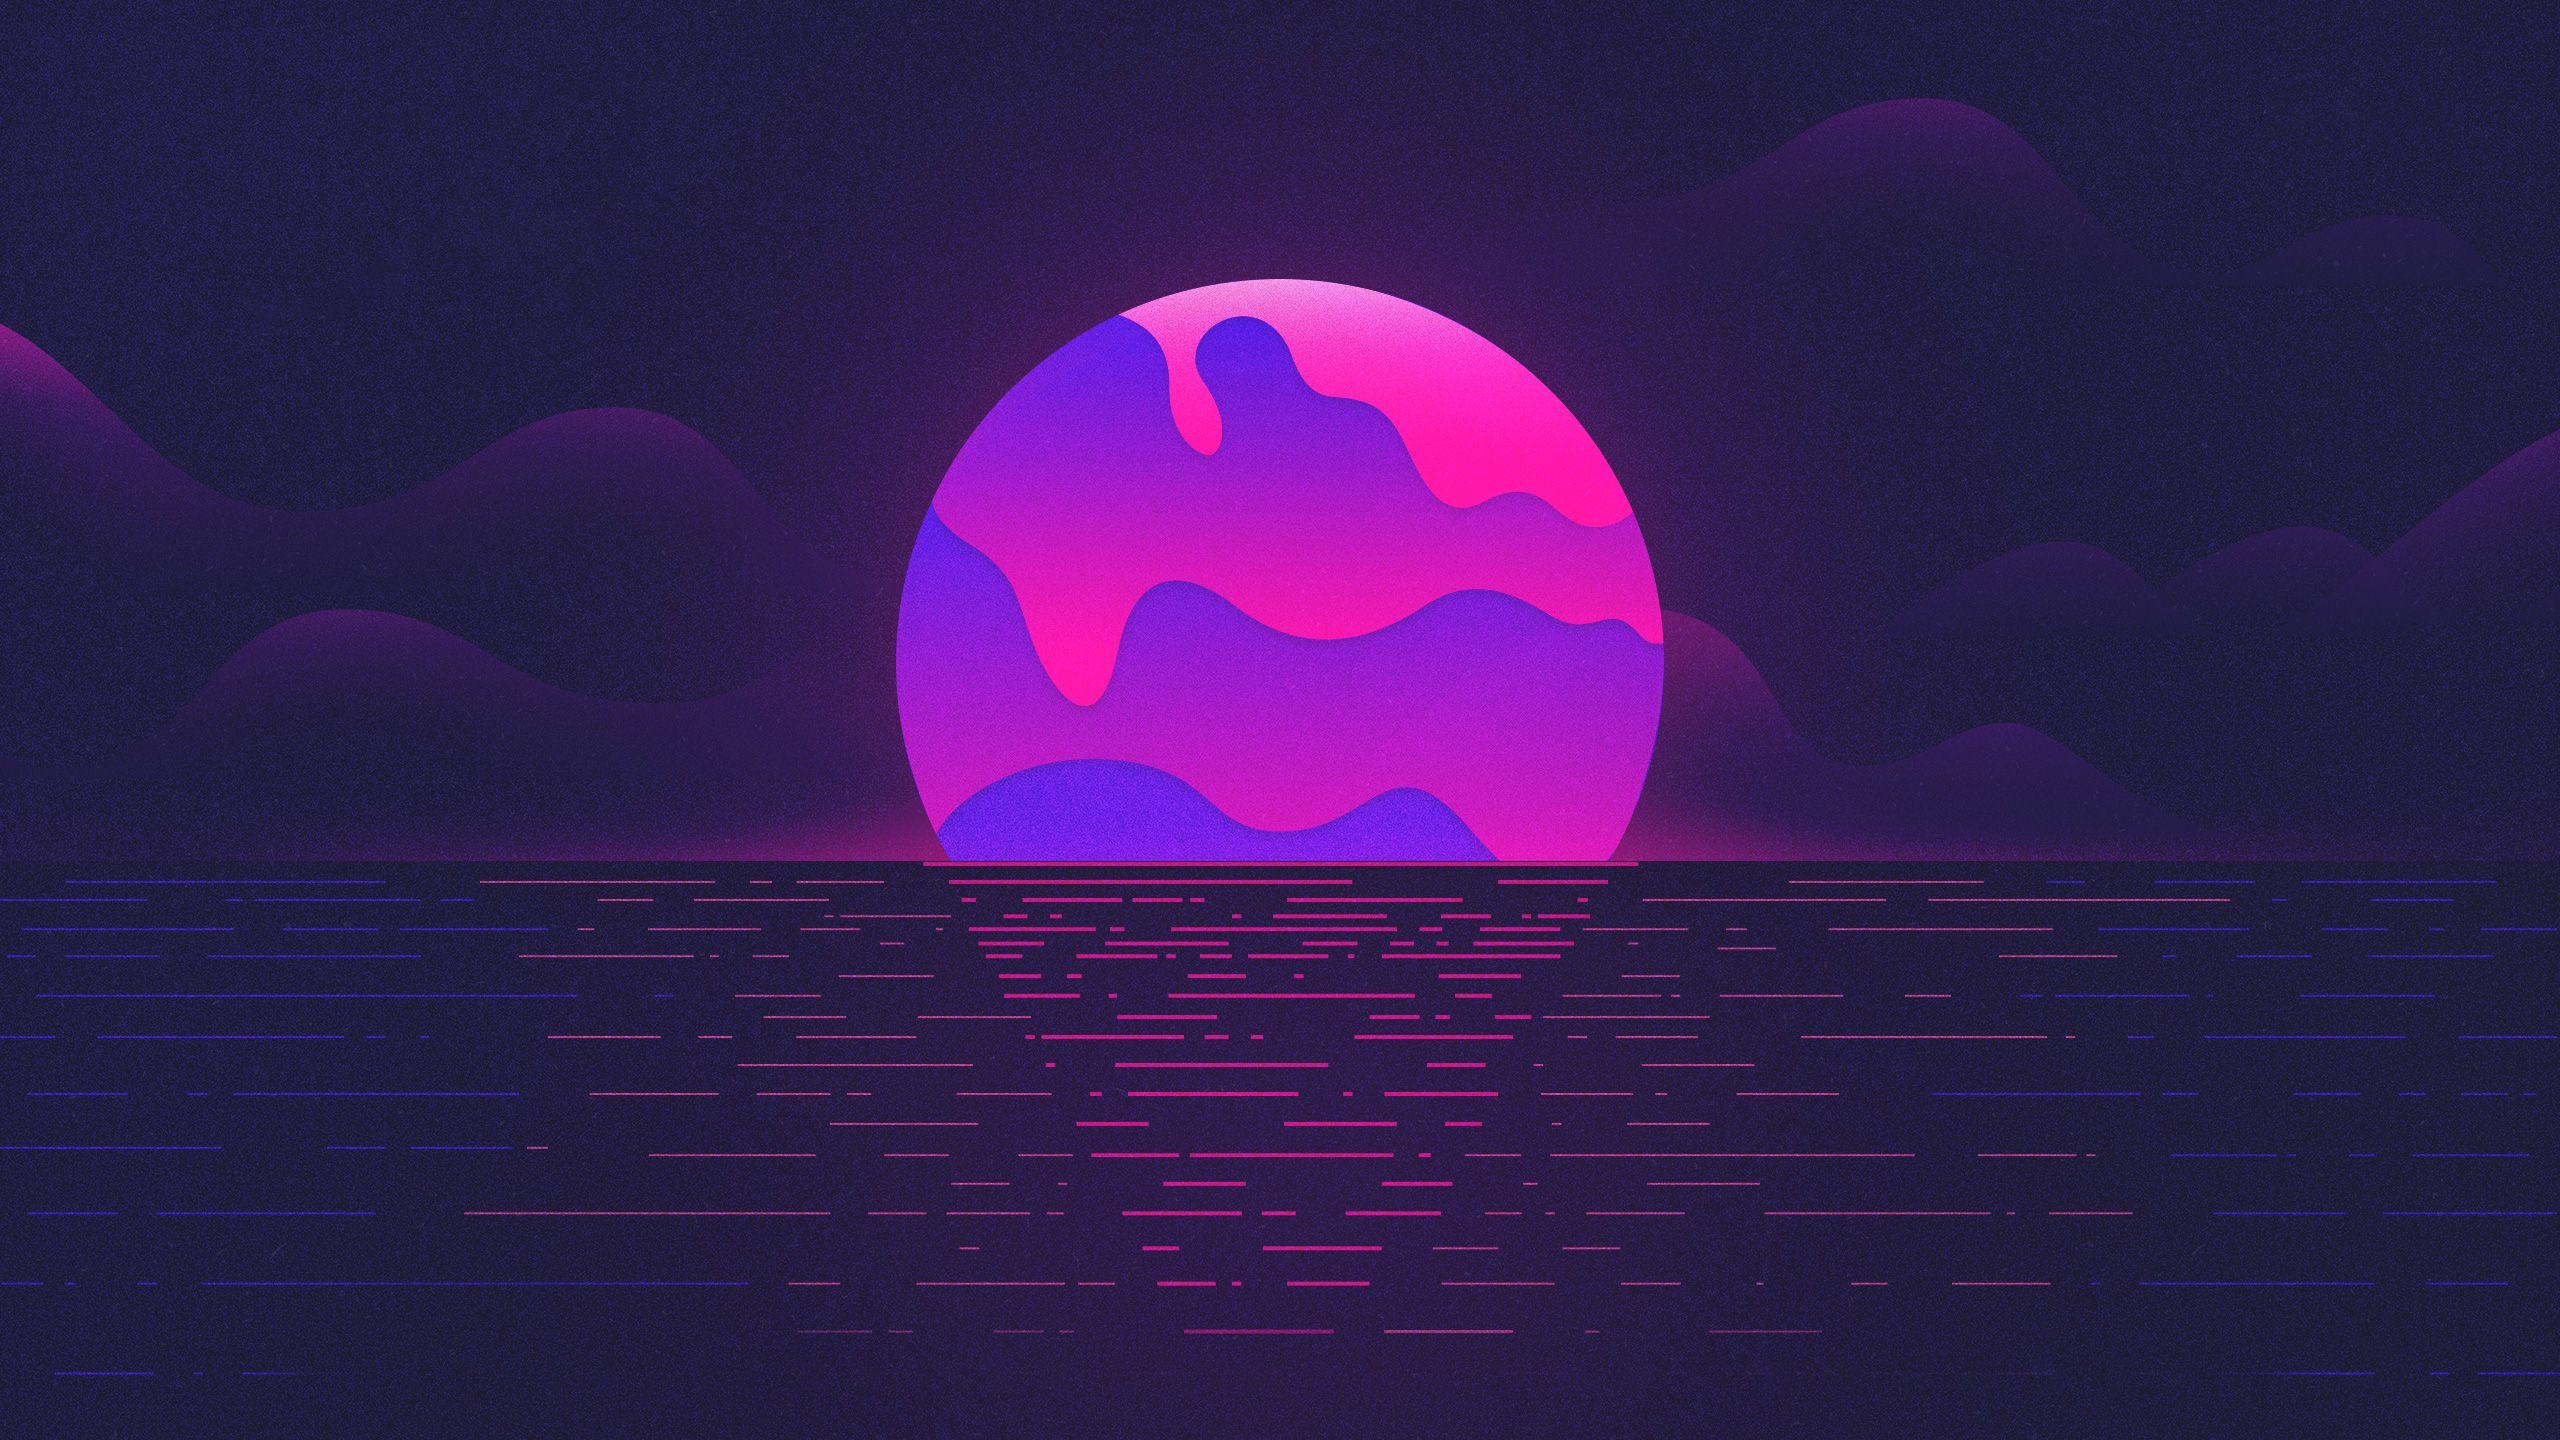 Vaporwave Sunset 2560x1440 Vaporwave Wallpaper Neon Wallpaper Hd Wallpaper